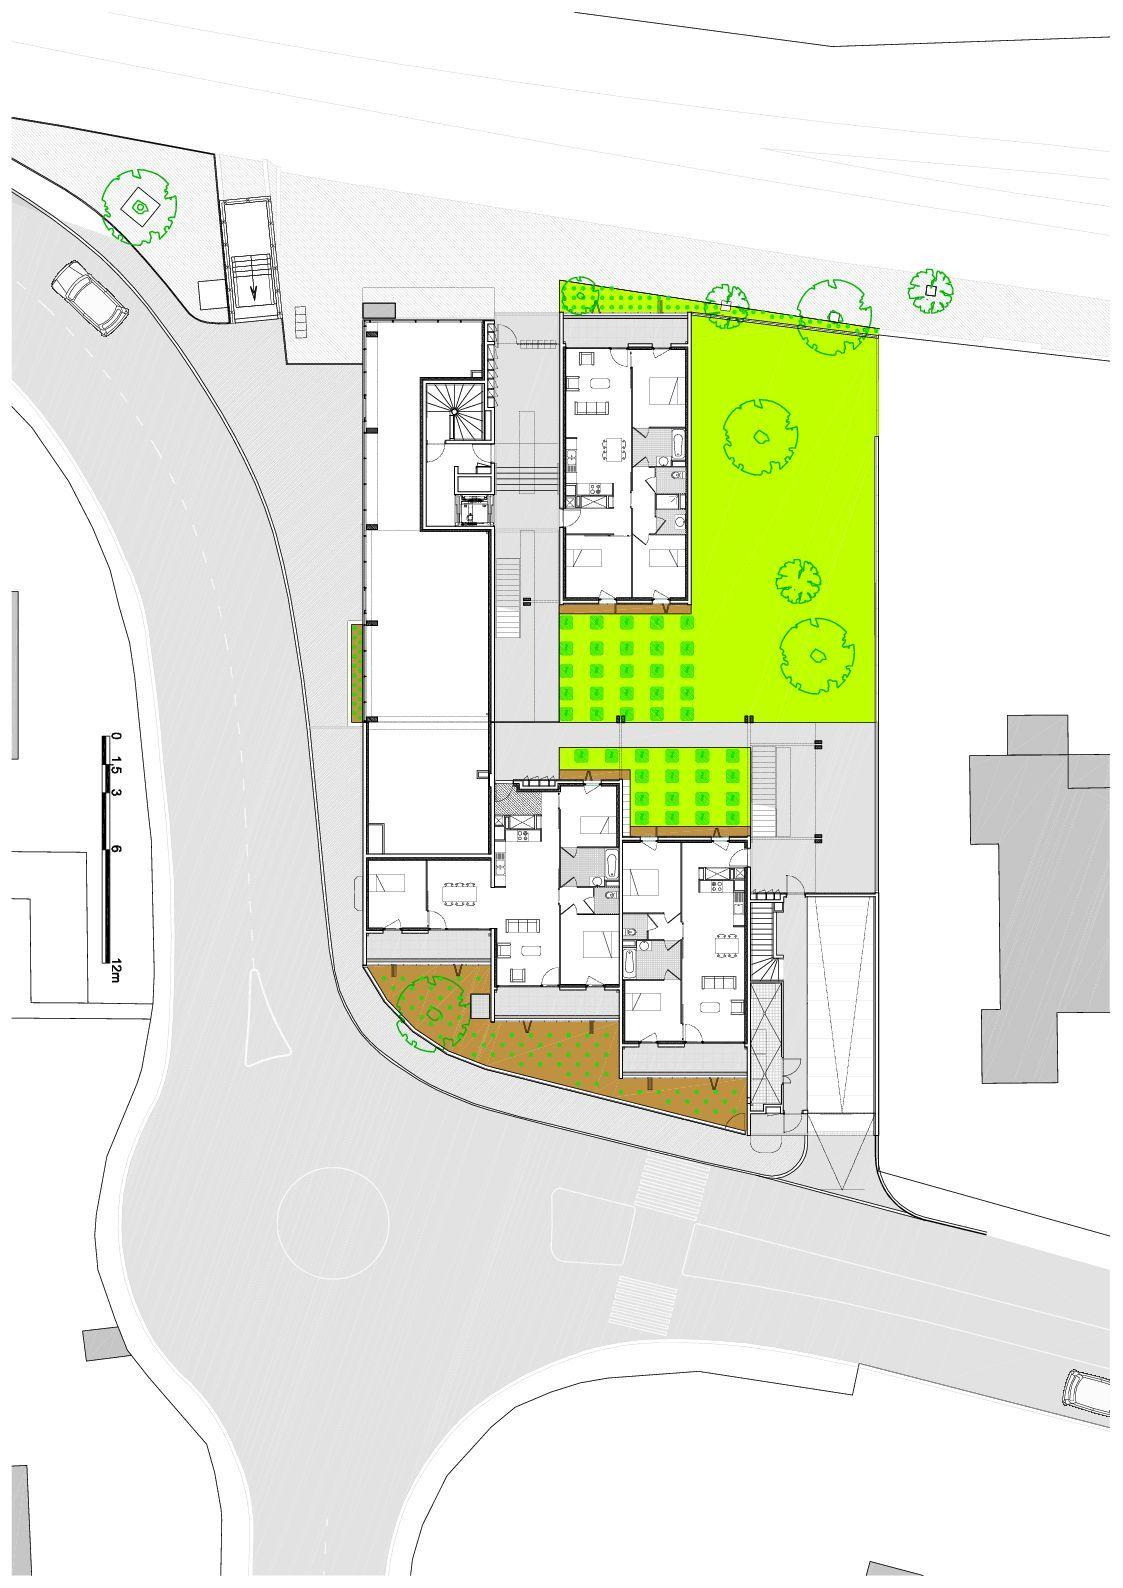 gallery of social housing shops in mouans sartoux comte et vollenweider architectes 38. Black Bedroom Furniture Sets. Home Design Ideas